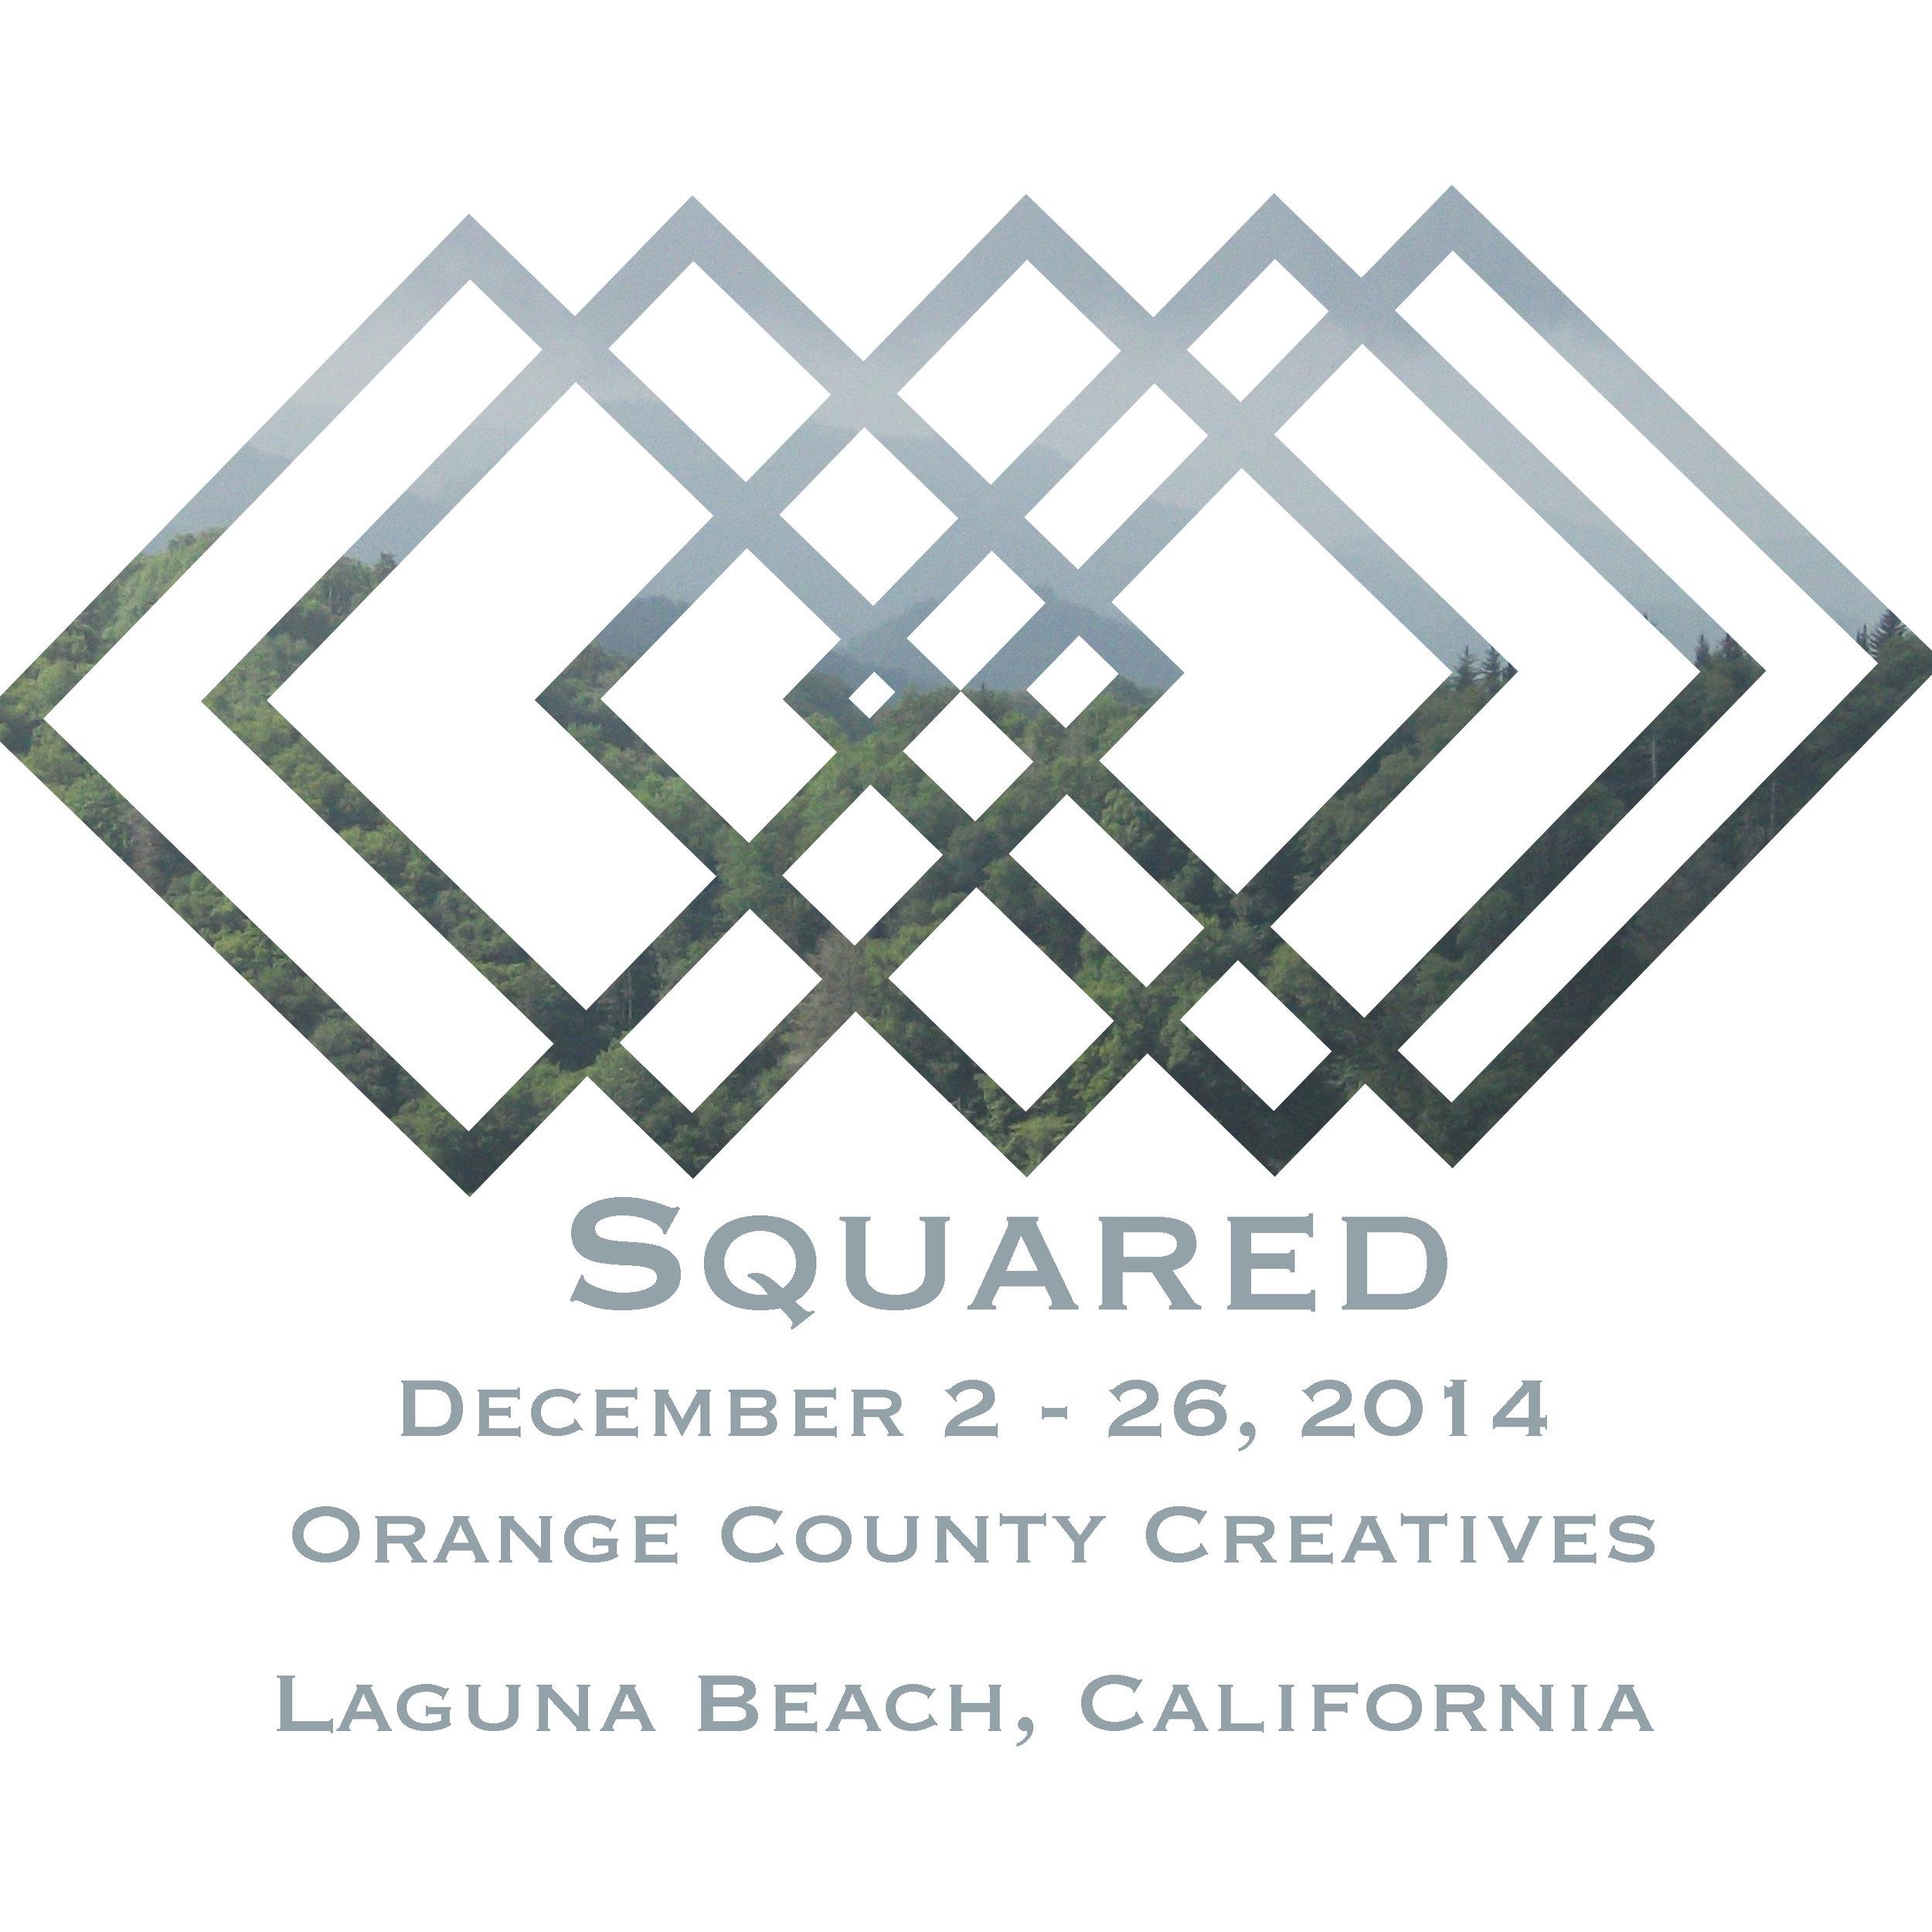 Squared  December 2 - 26, 2014  Orange County Creatives  Laguna Beach, California